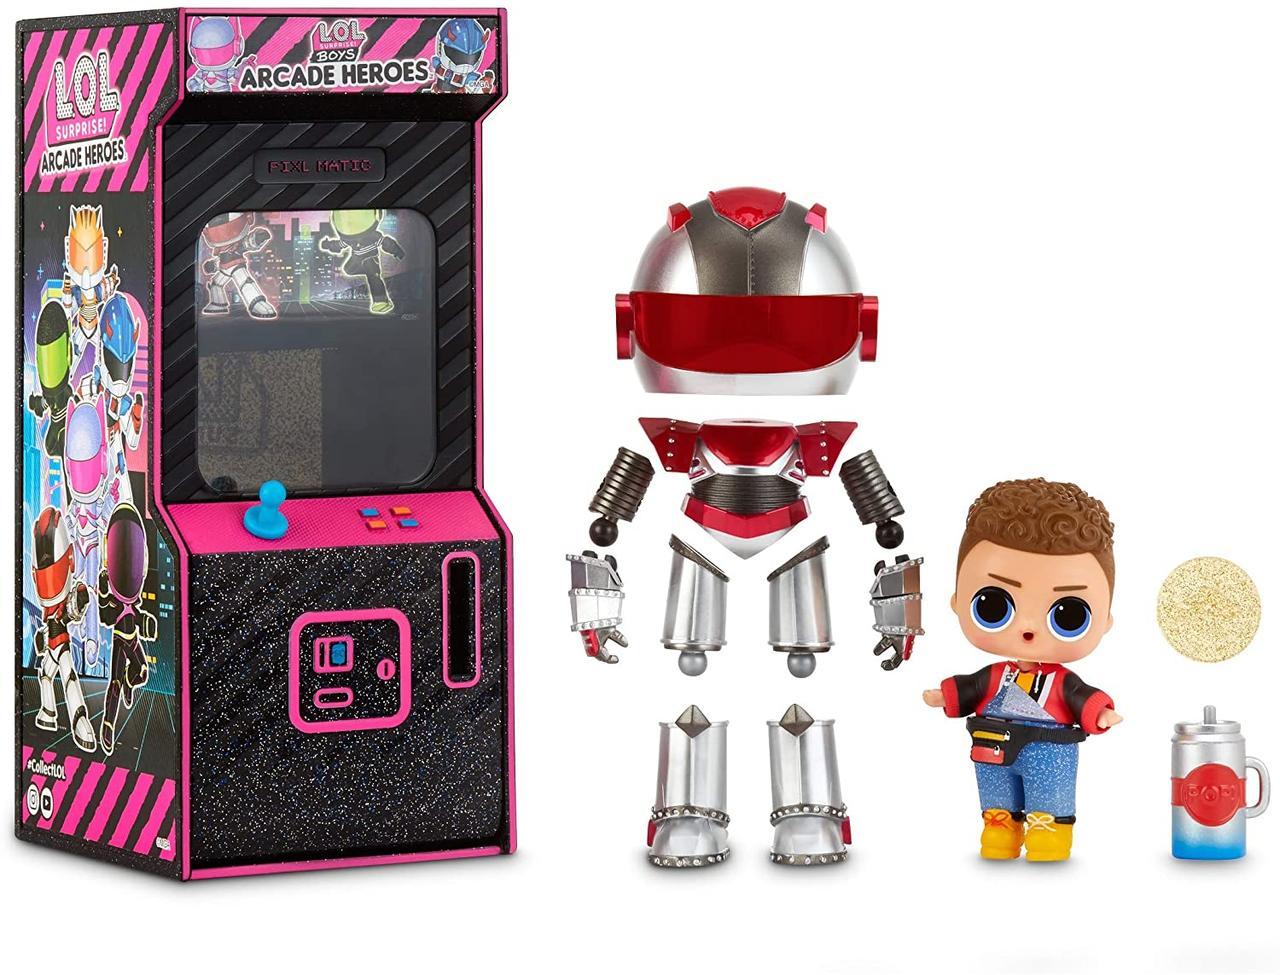 Мальчики лол Космонавты Герои аркады L.O.L. Boys Arcade Heroes Оригинал (569374)